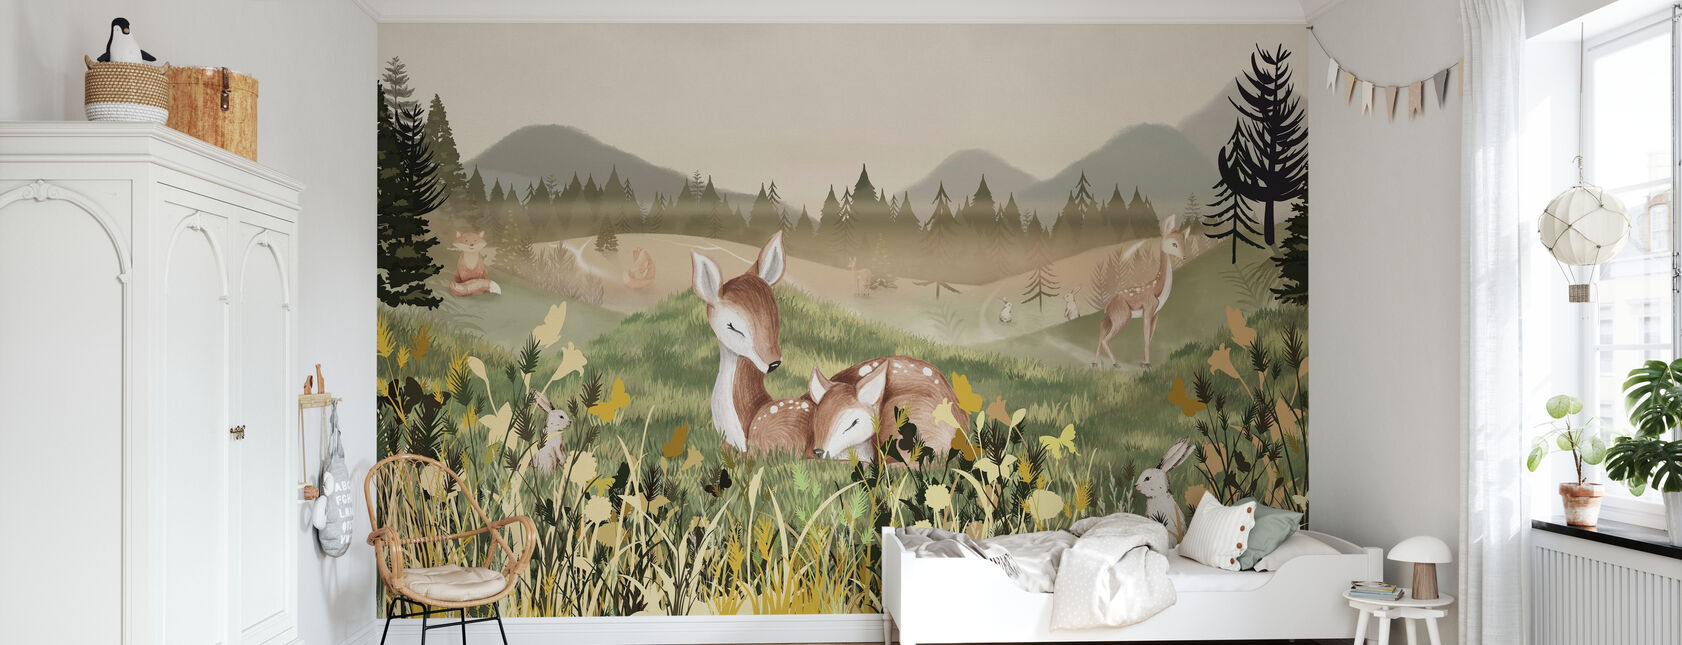 Relaxing Forest - Wallpaper - Kids Room